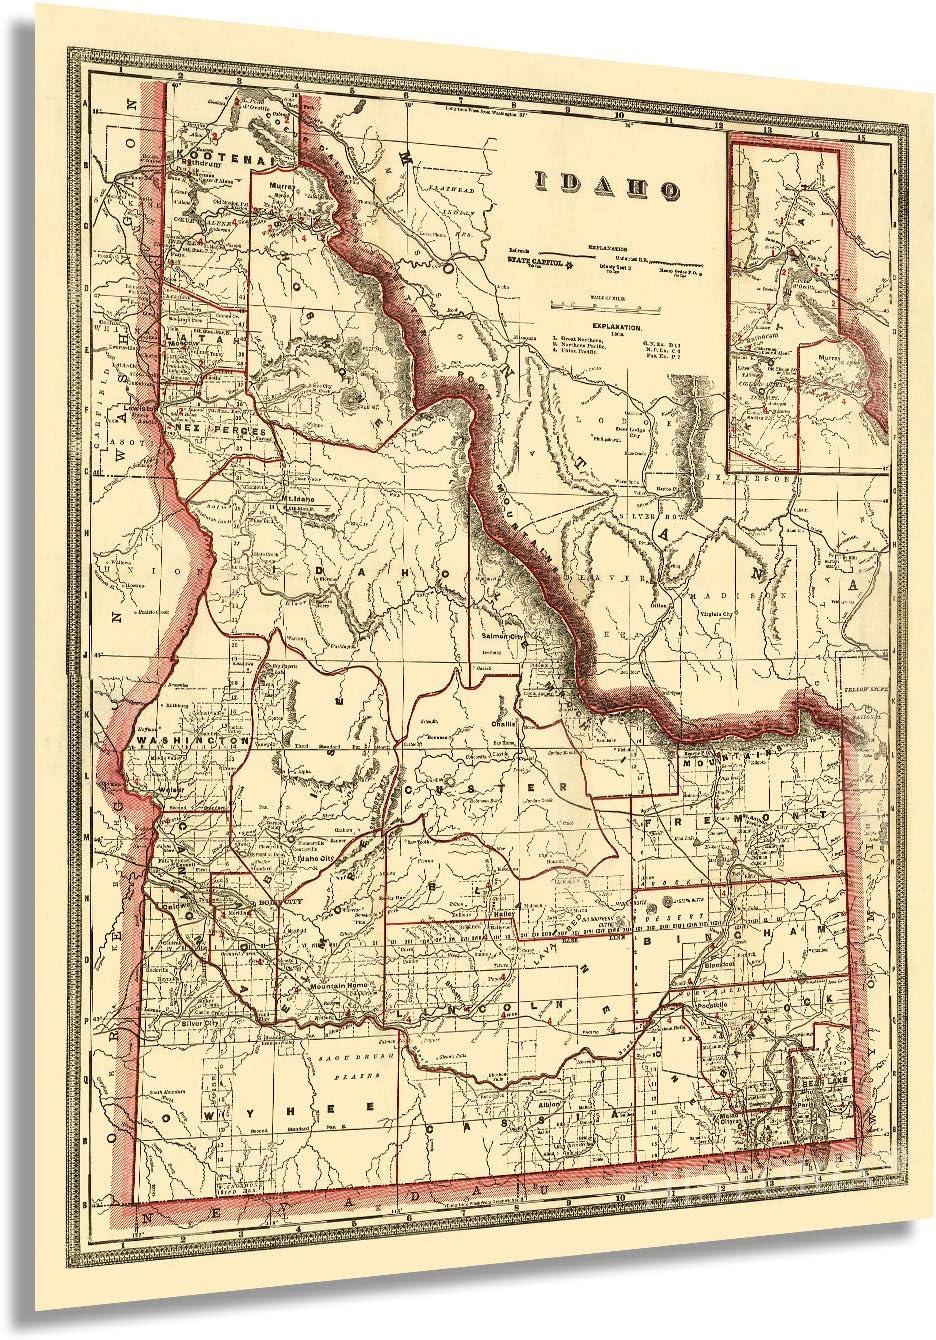 HISTORIX Vintage 1896 Idaho State Map - 24x30 Inch Vintage Map of Idaho Wall Art - Old Township County and Railroad Map of Idaho Poster - Map Idaho Wall Decor - Historic Idaho Wall Map (2 Sizes)